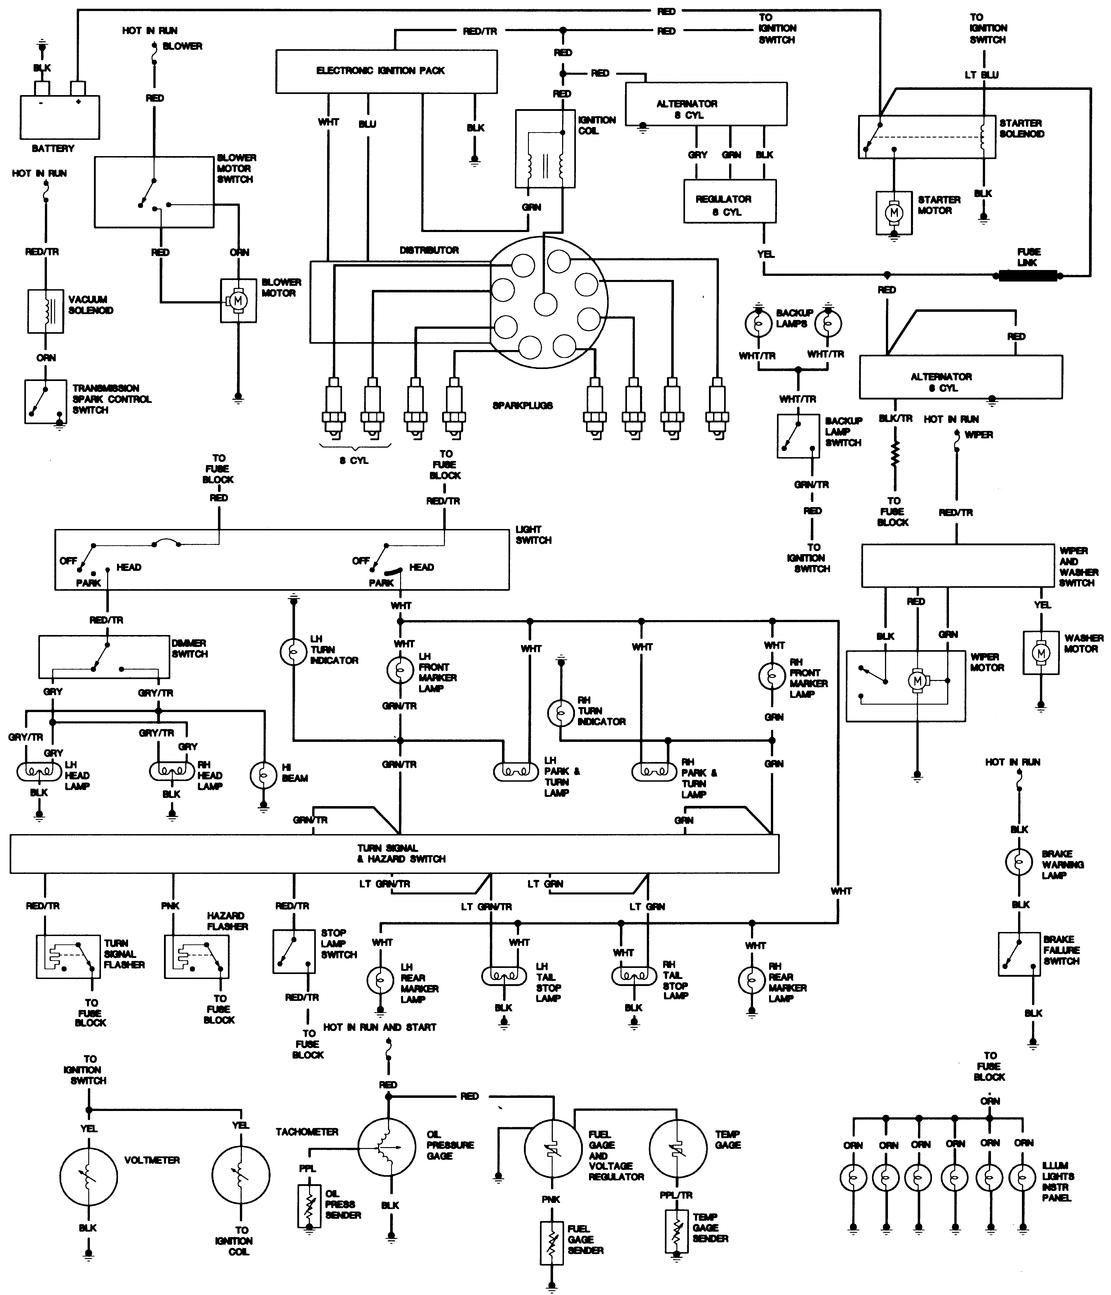 Jeep cj wiring diagram wiring diagrams online